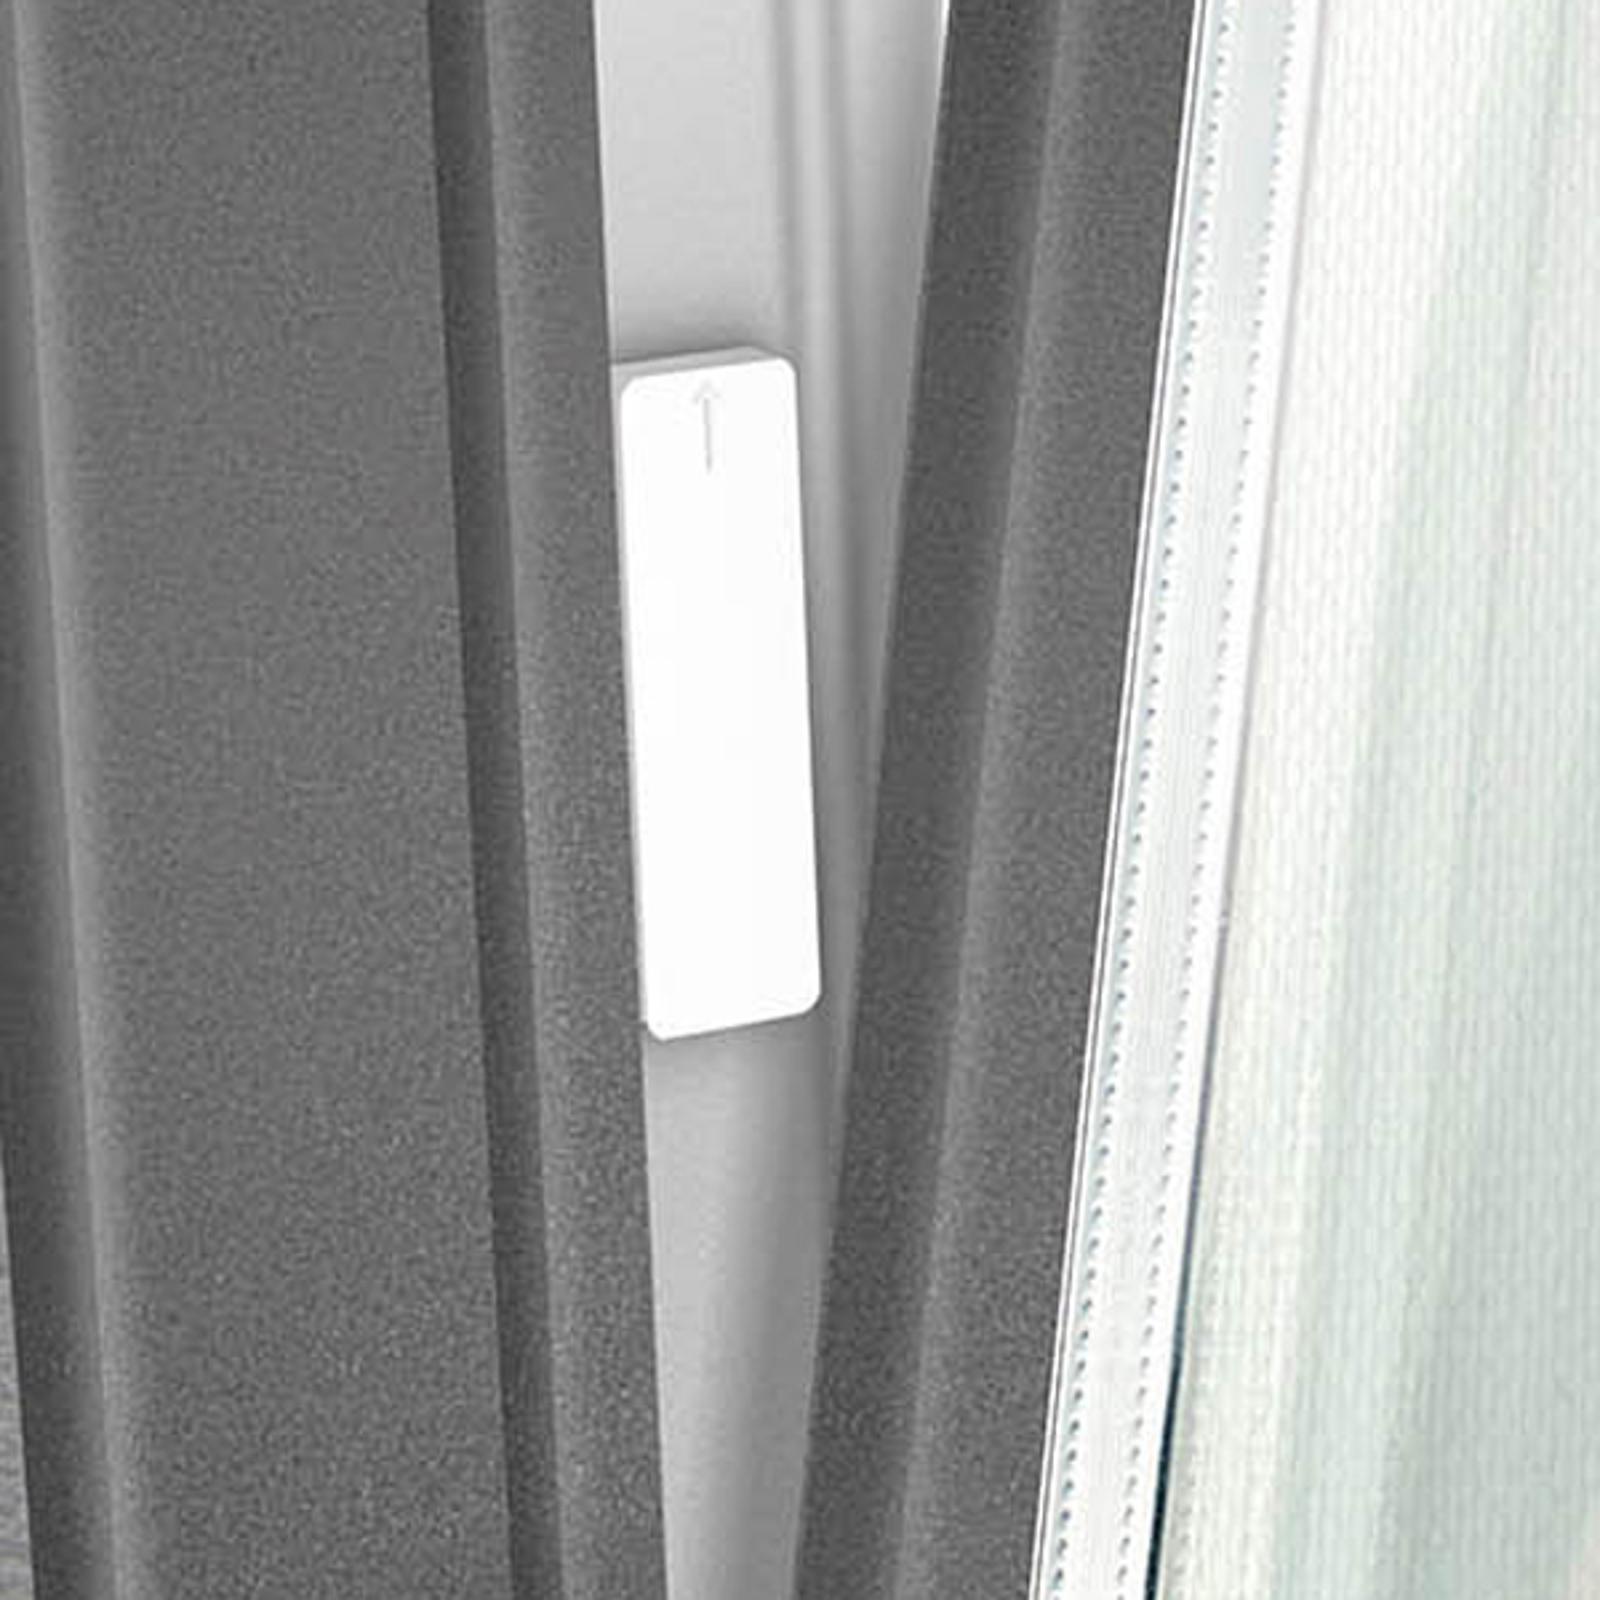 Rademacher DuoFern vindu/dør-kontakt